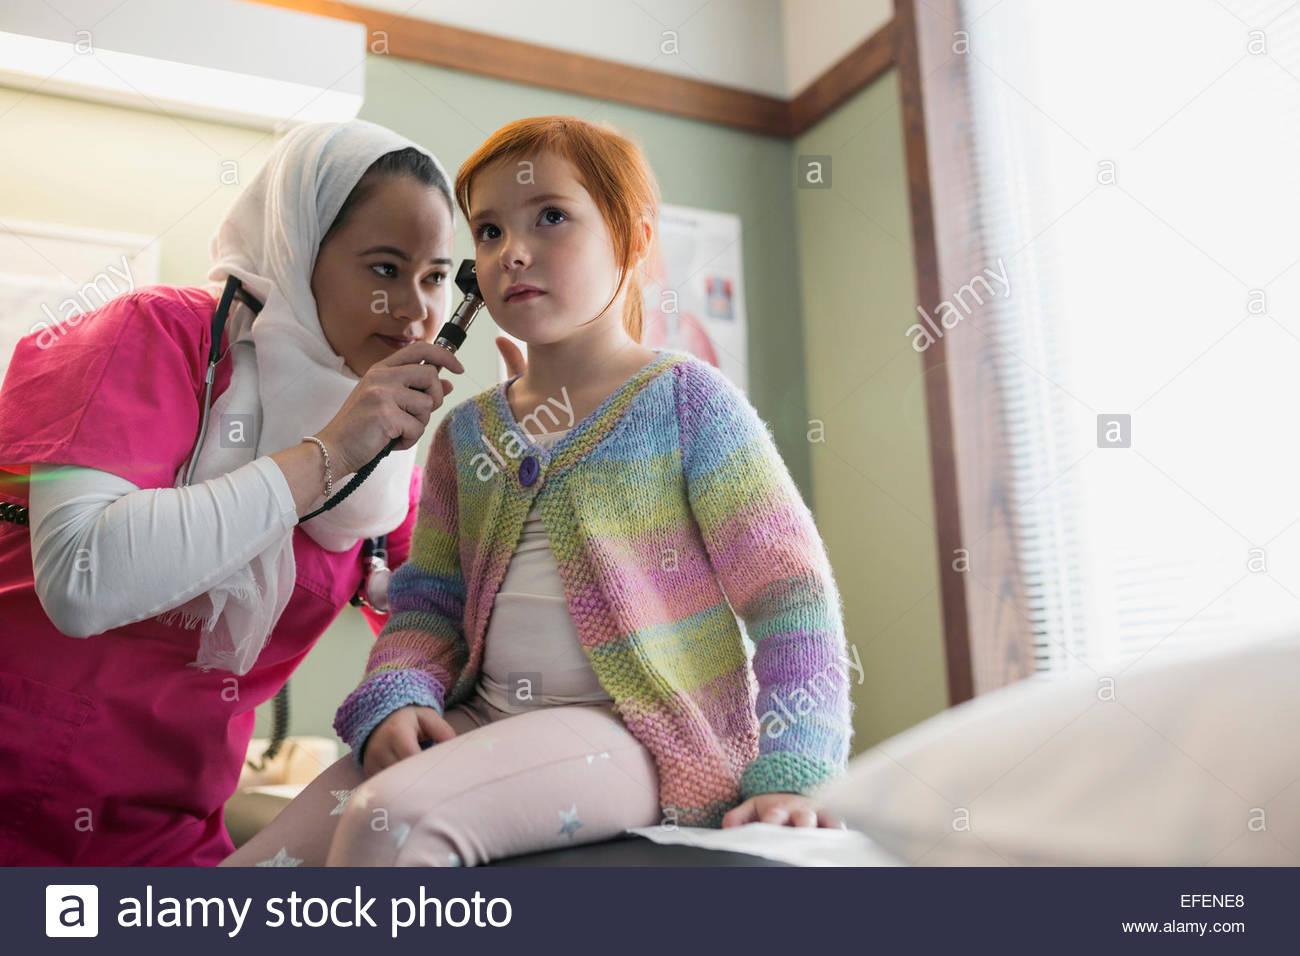 Nurse wearing hijab checking ears of girl - Stock Image